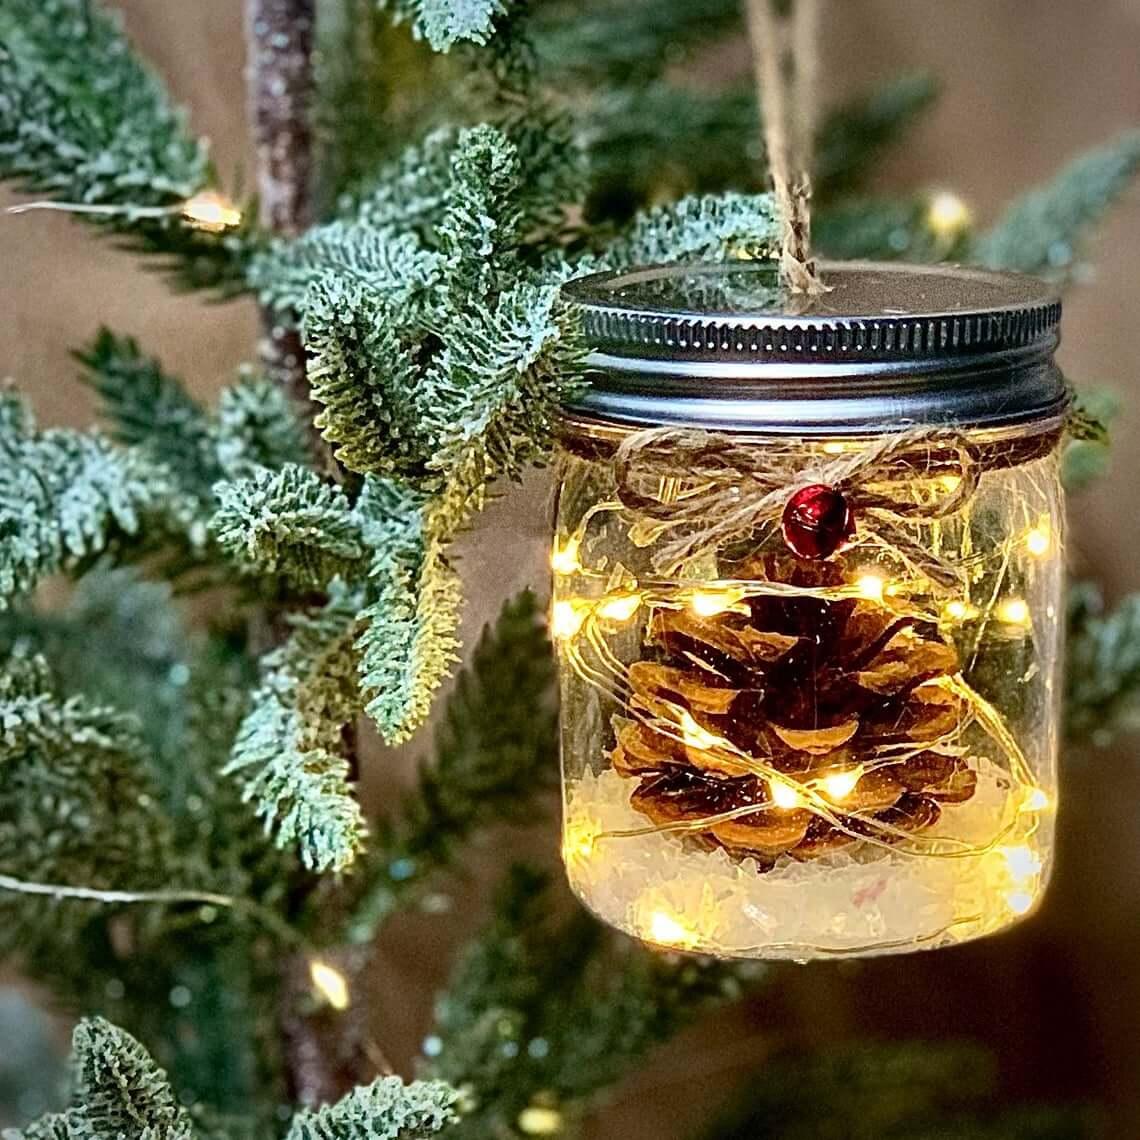 Miniature Mason Jar pinecone Ornaments with Lights